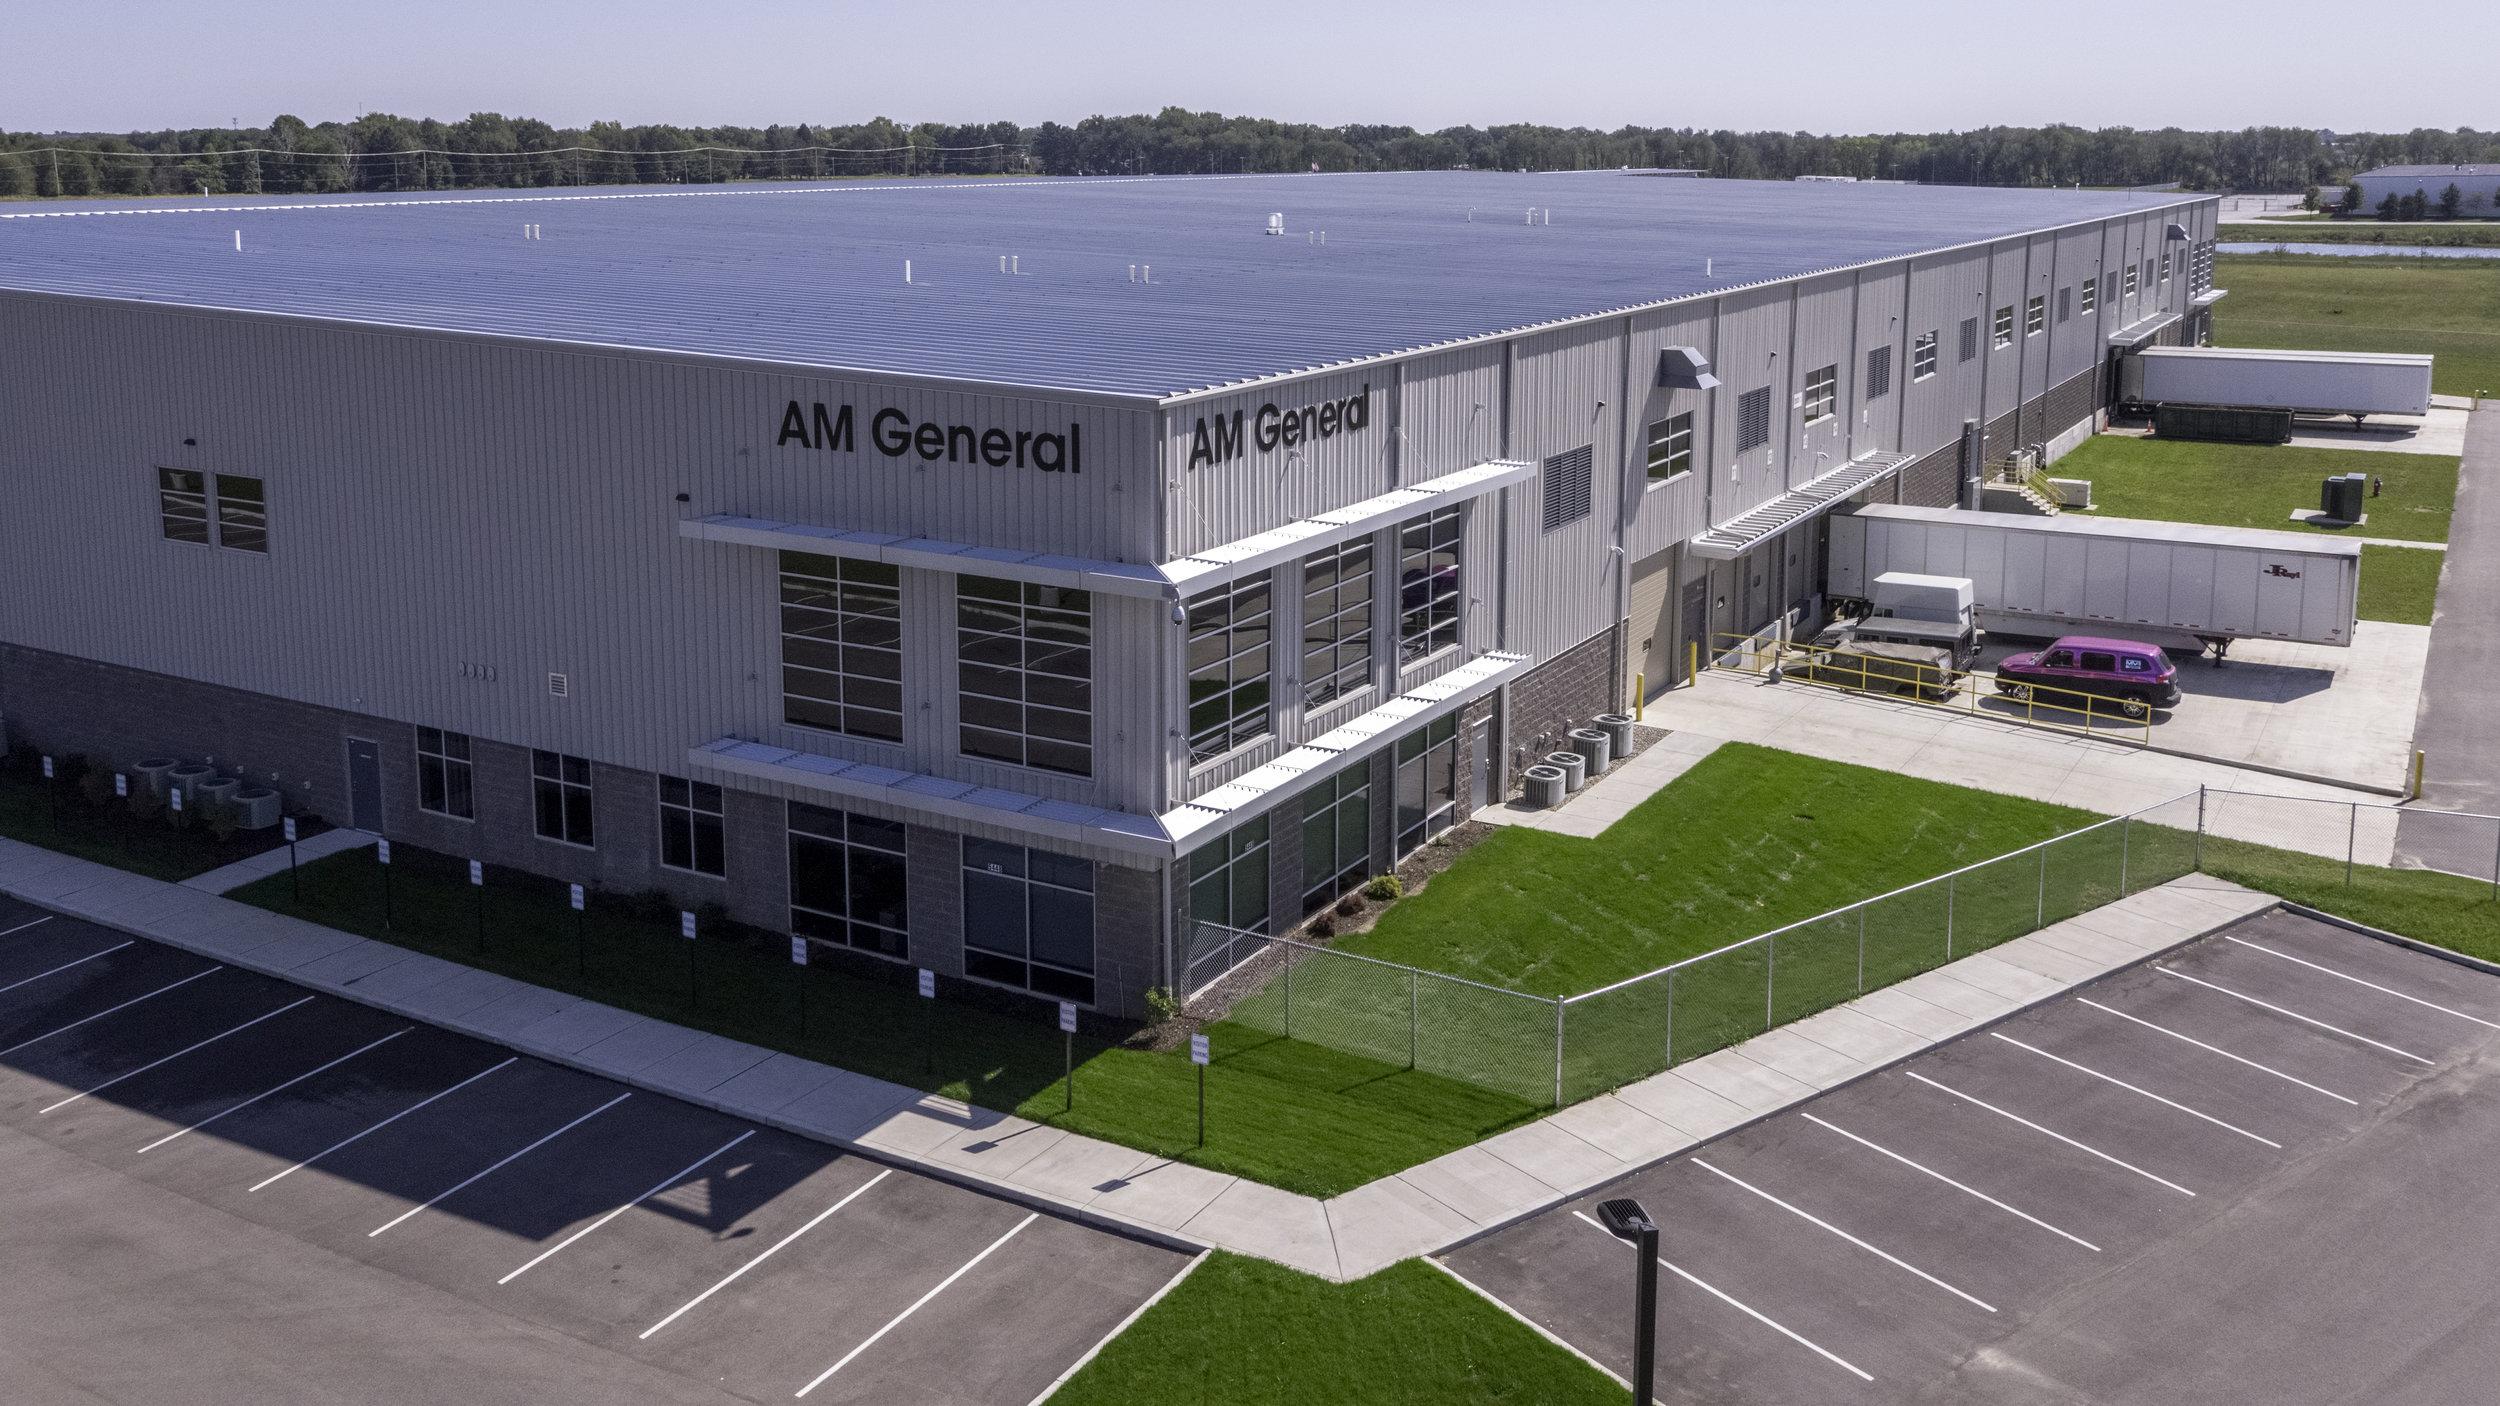 AM General Service, Parts & LogisticsSouth Bend Indiana